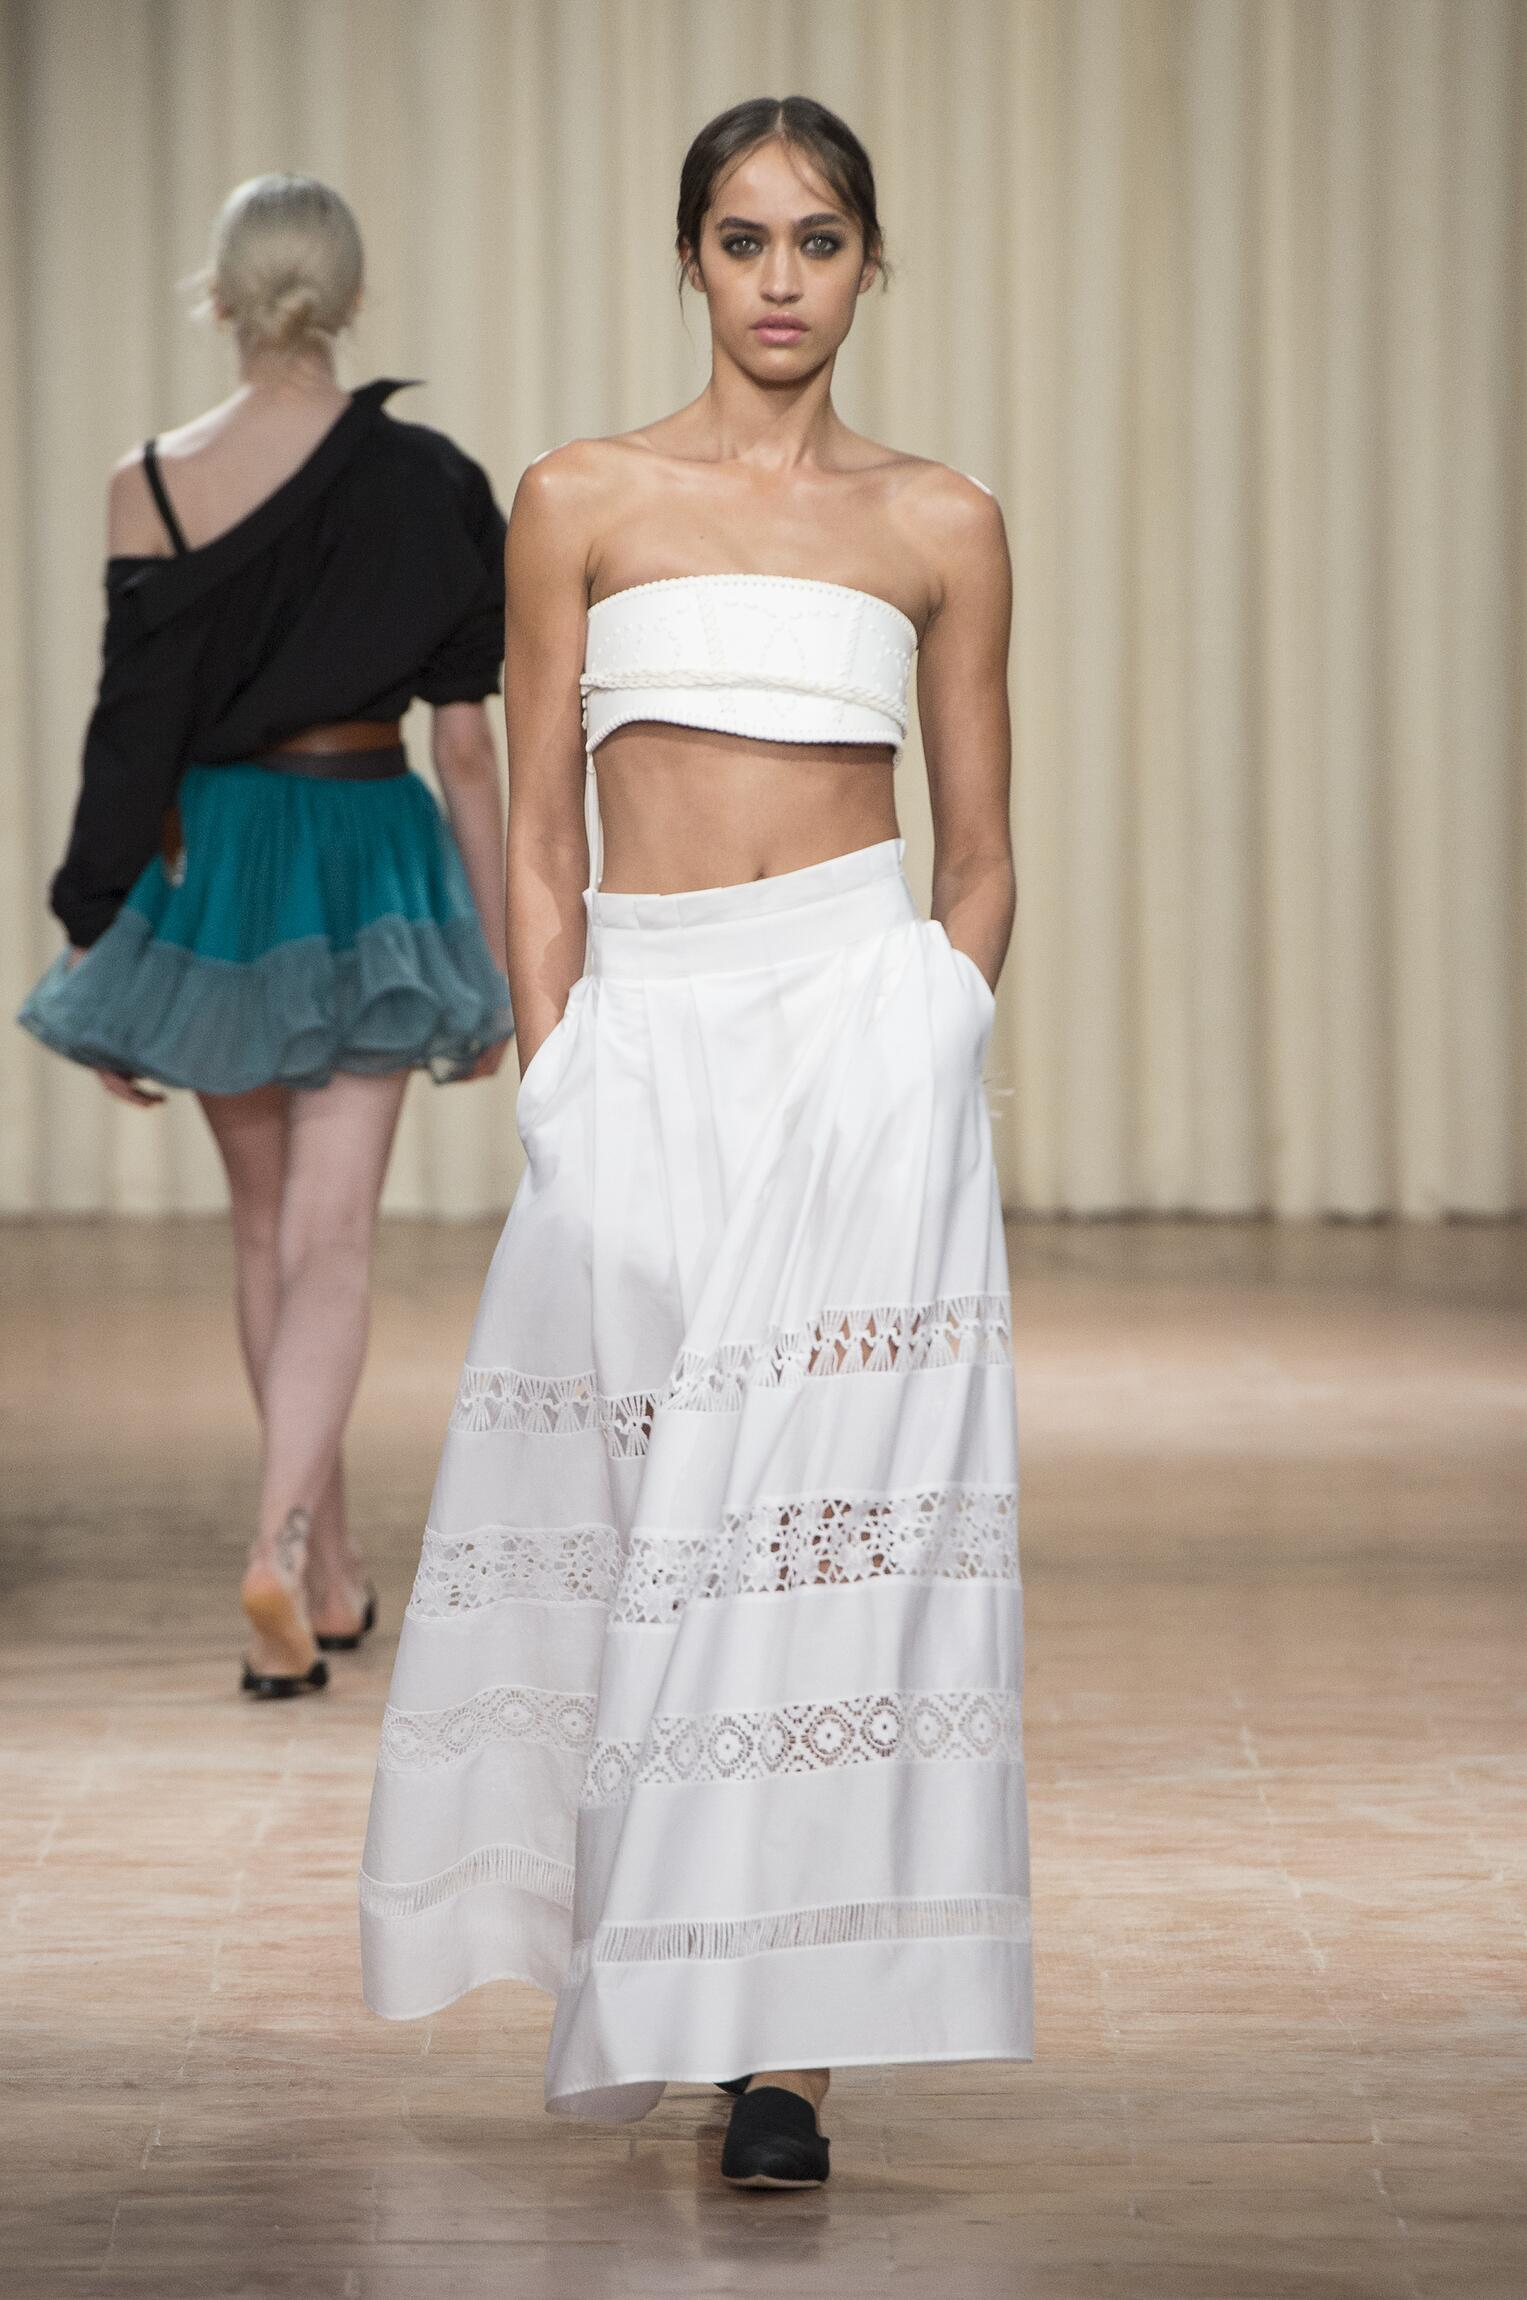 Catwalk Alberta Ferretti Woman Fashion Show Summer 2017